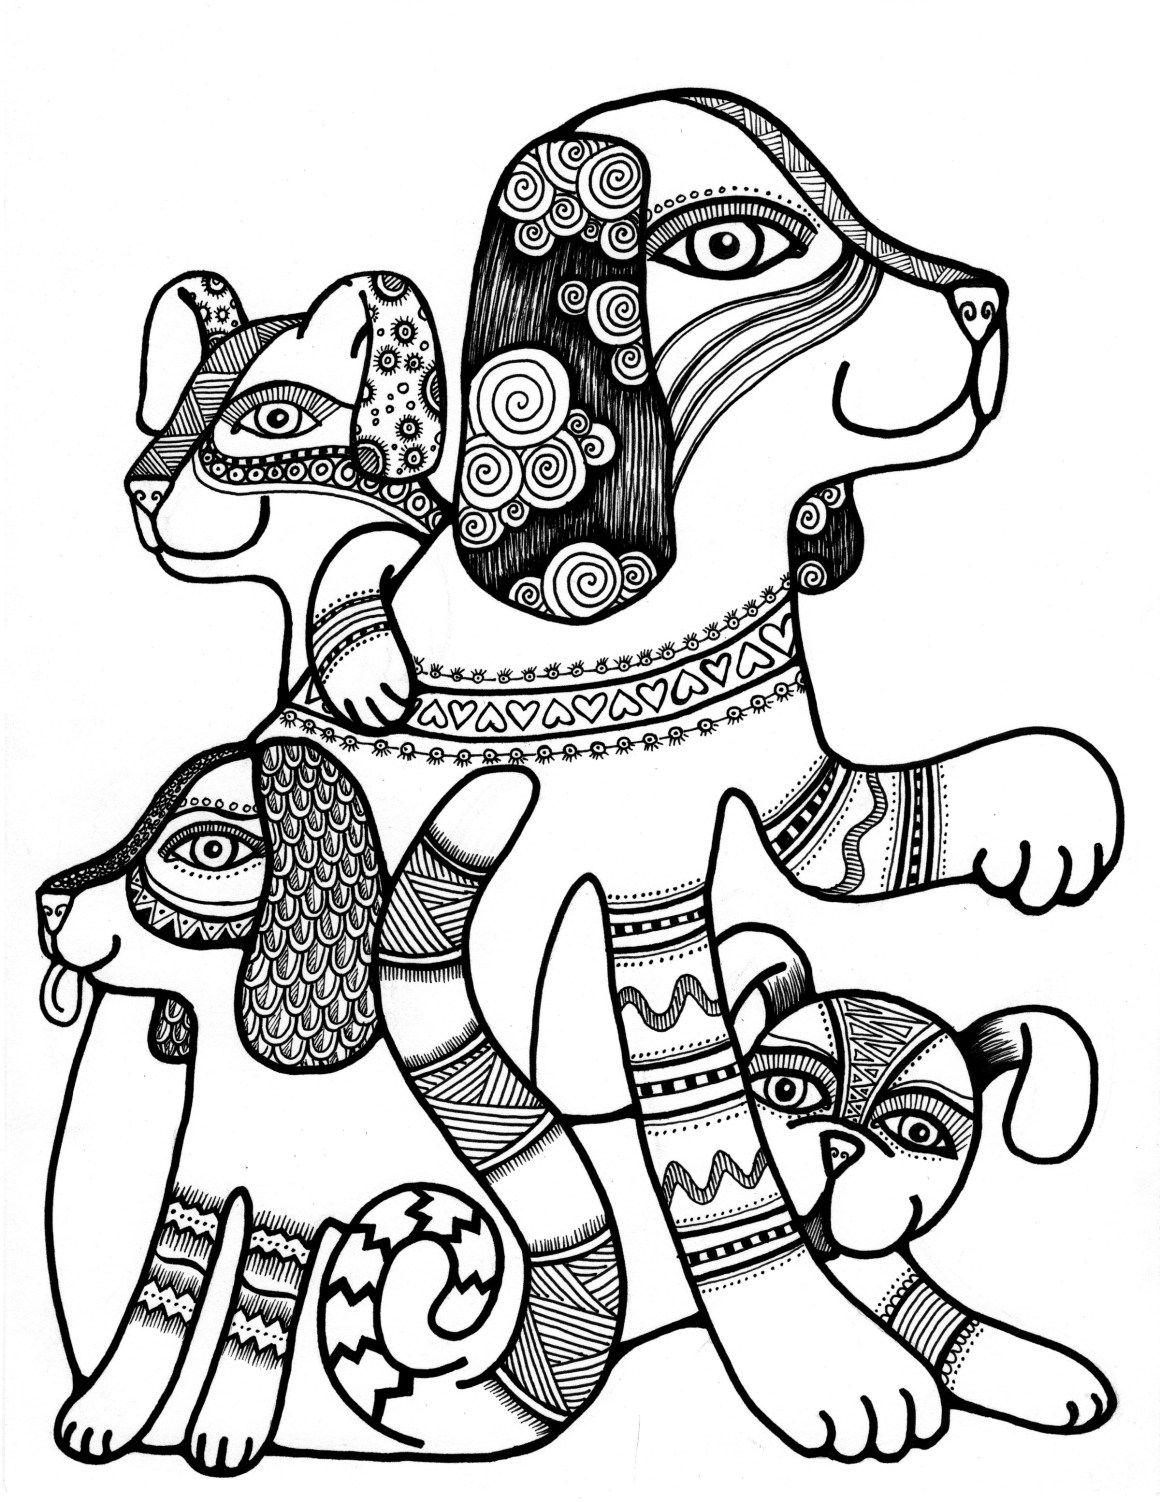 Pin By Love Beautiful On Dogs Mandala Coloring Pages Dog Coloring Page Coloring Pages [ 1502 x 1160 Pixel ]